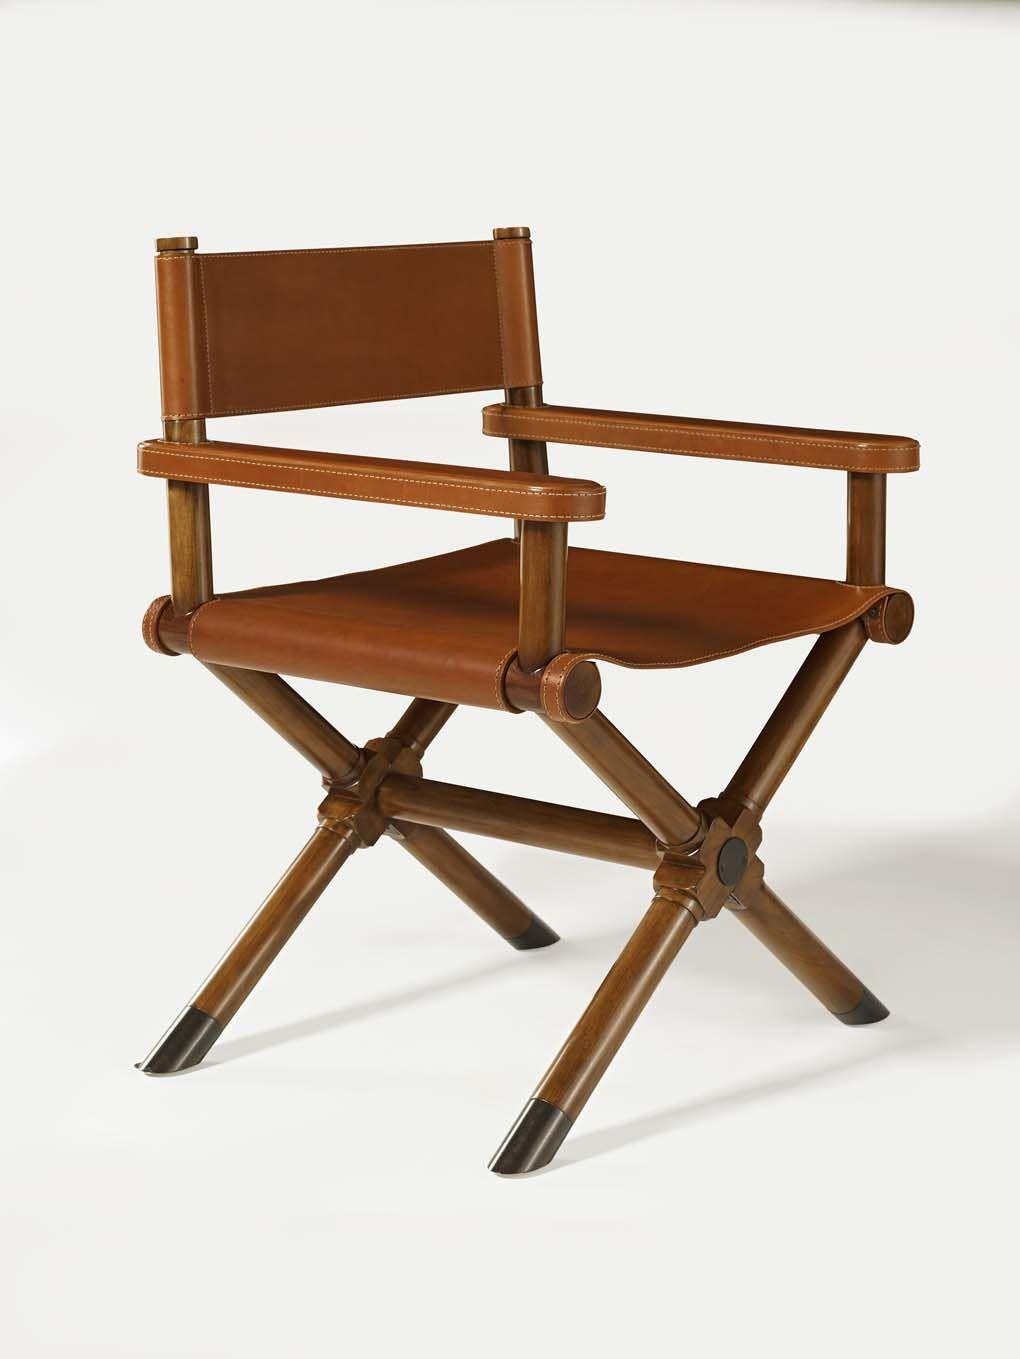 Modern savonarola chair - Director S Chair Desert Modern Chairs Ottomans Furniture Products Ralph Lauren Home